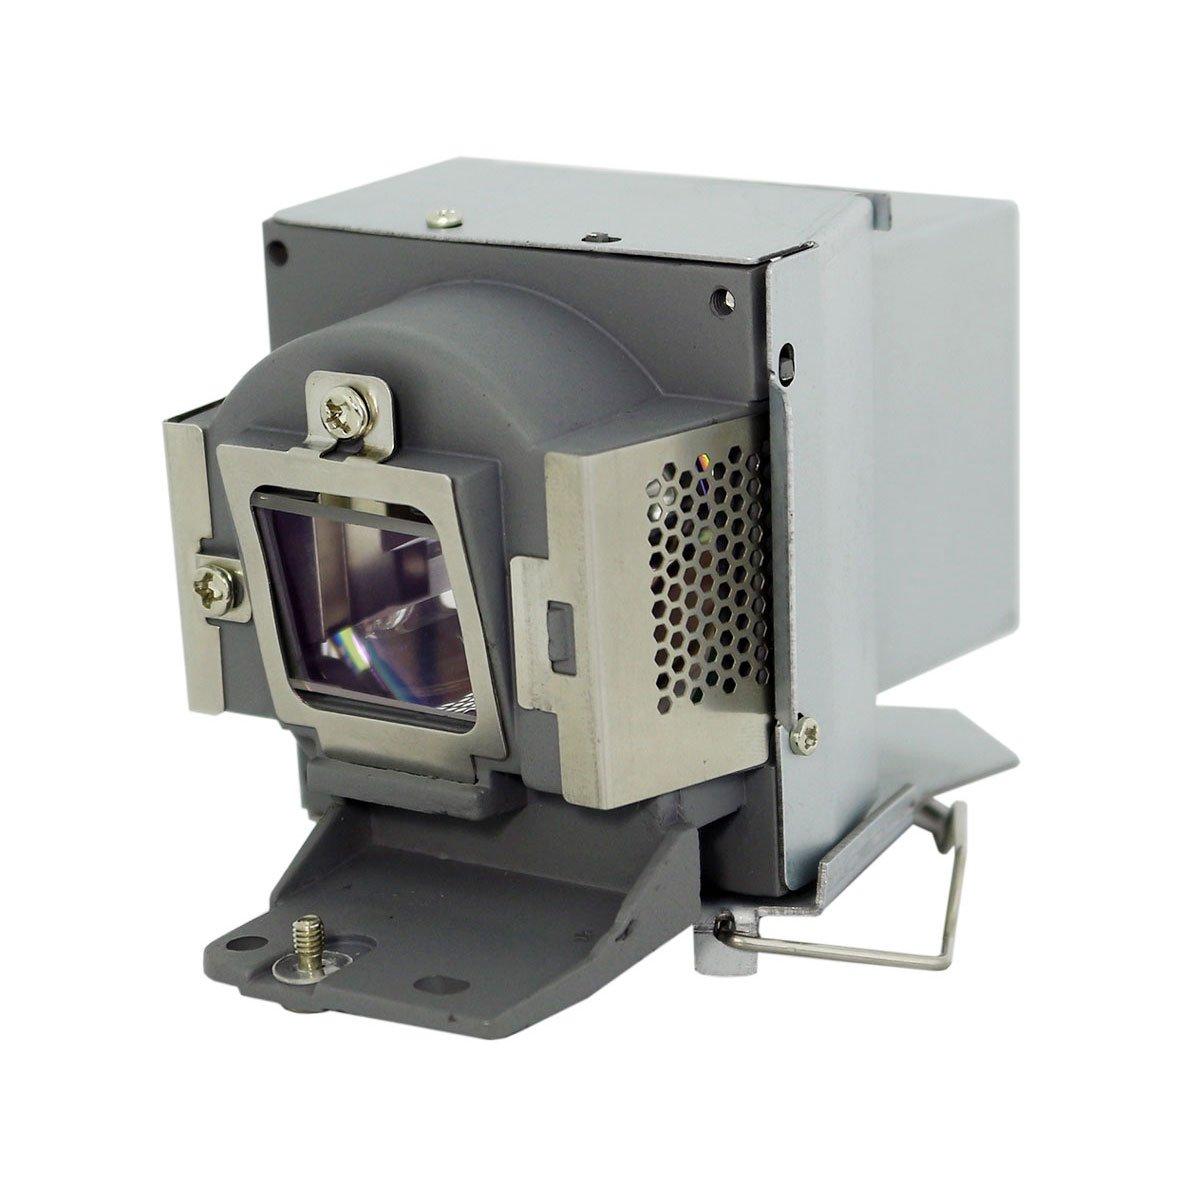 Lutema プロジェクター交換用ランプ ハウジング/電球付き BenQ MW817ST用 Platinum (Brighter/Durable) B07KTL4YTW Lamp with Housing Platinum (Brighter/Durable)